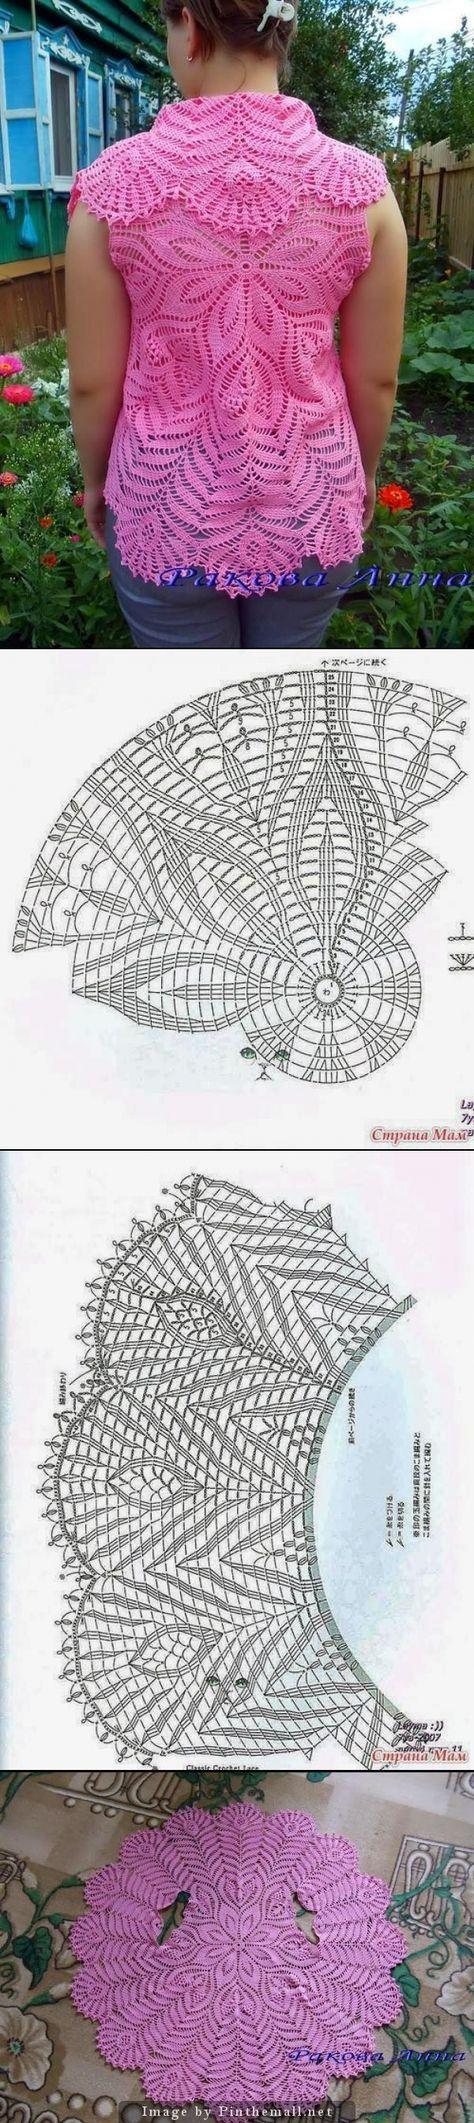 Crochet lace circular vest ~~ | häkeln | Pinterest | Chalets, Tejido ...